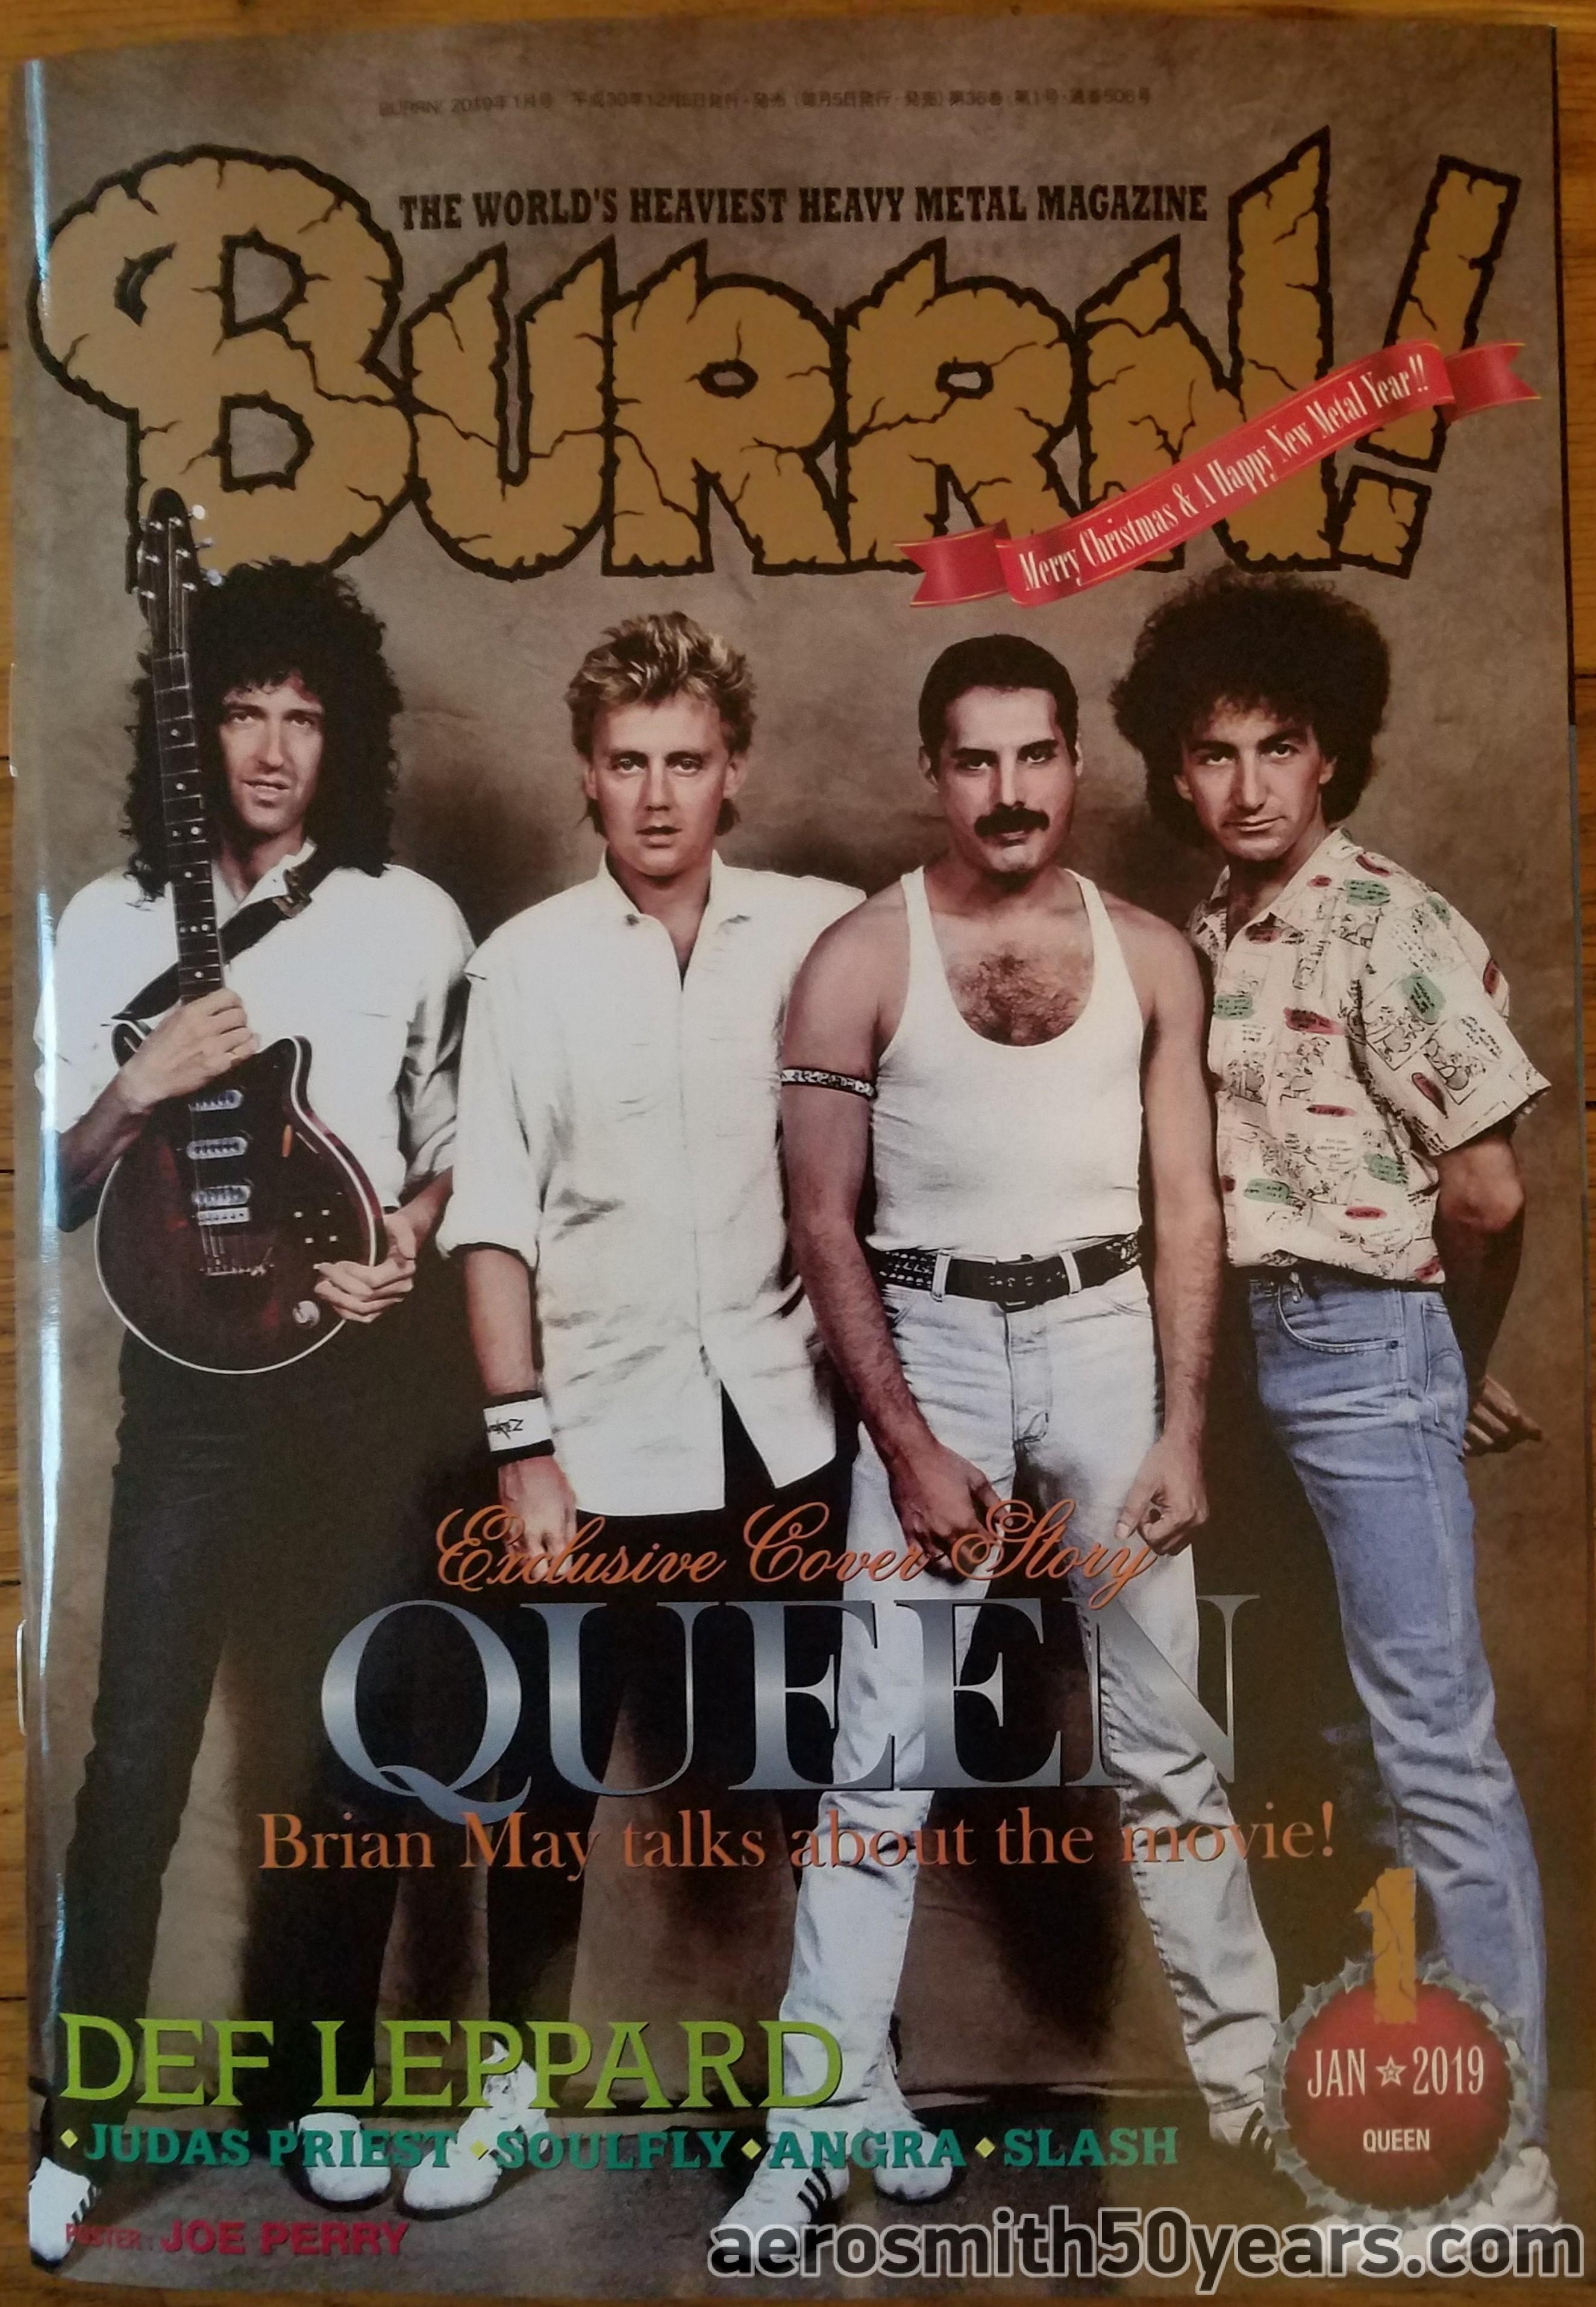 Burrn! Janurary 2019 Japan Magazine With Joe Perry Centerfold Calender